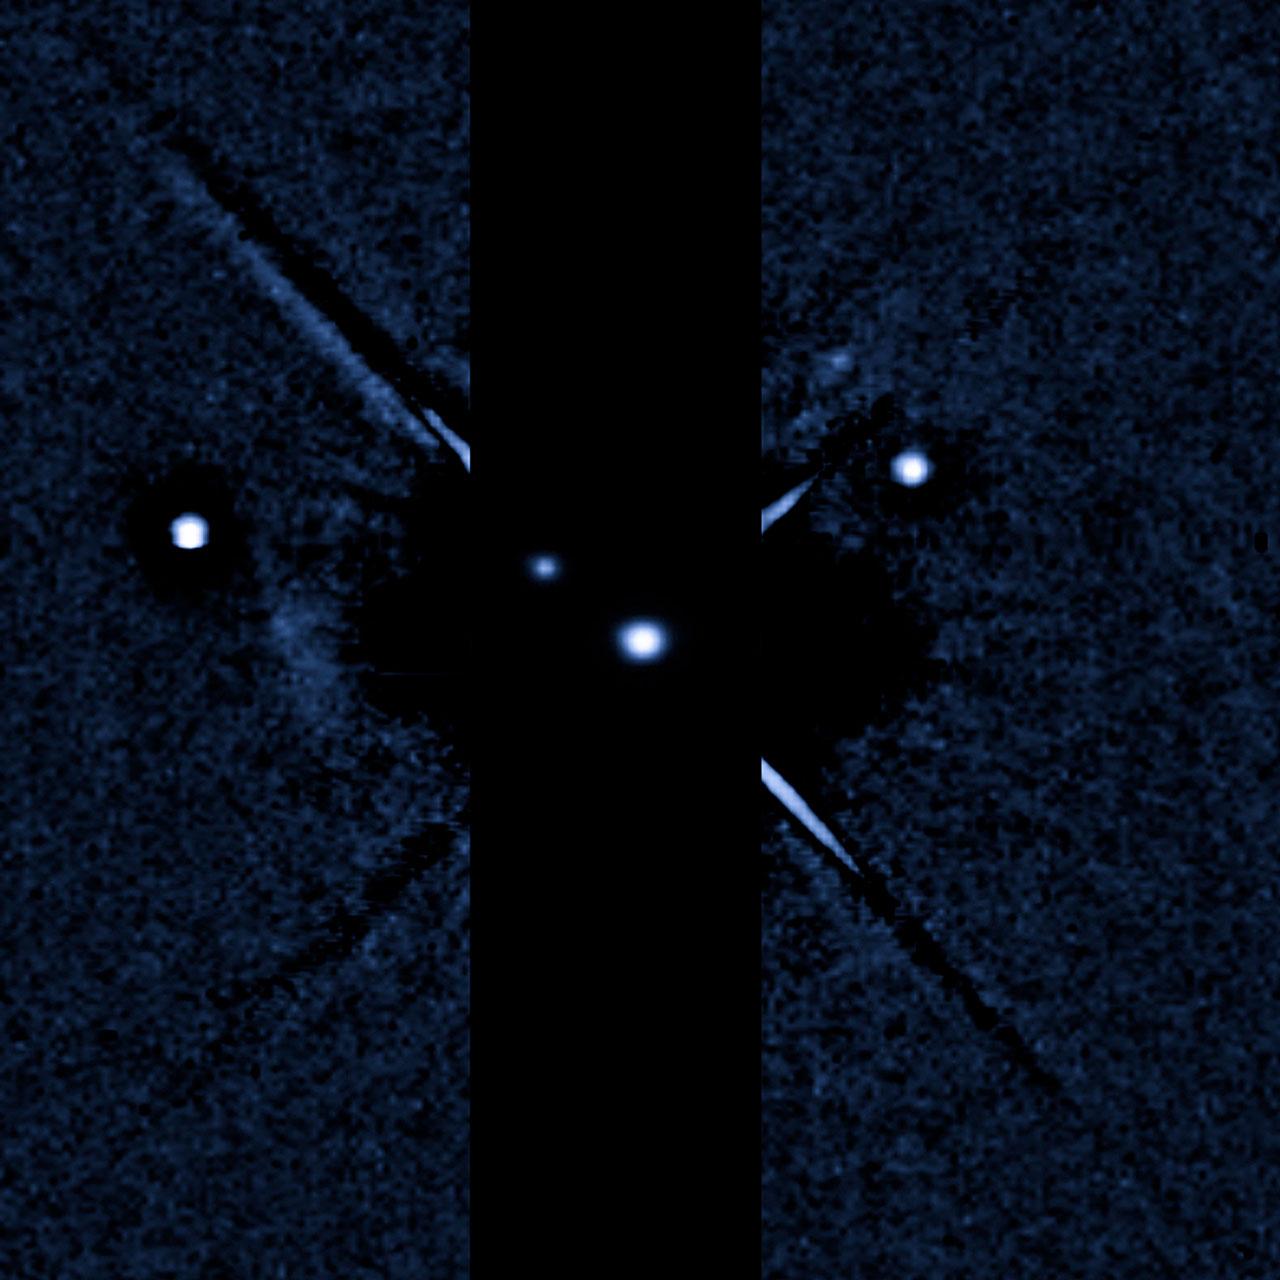 Pluto: 3 July 2011